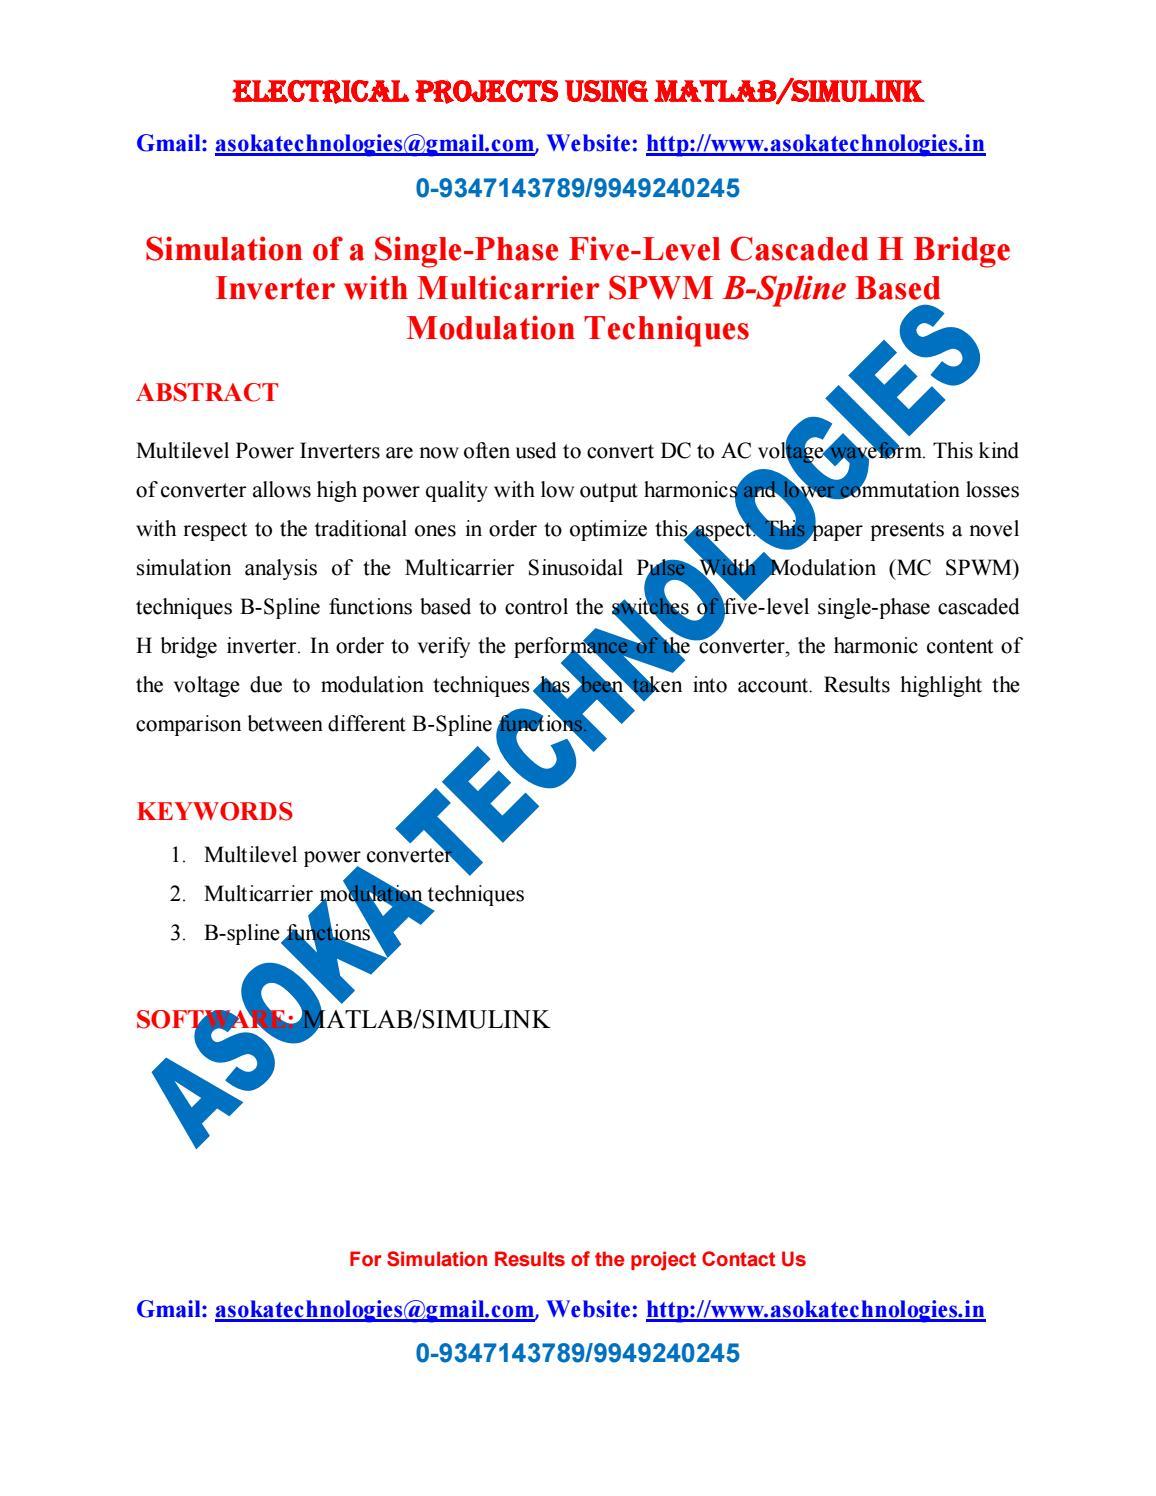 Simulation of a Single-Phase Five-Level Cascaded H Bridge Inverter